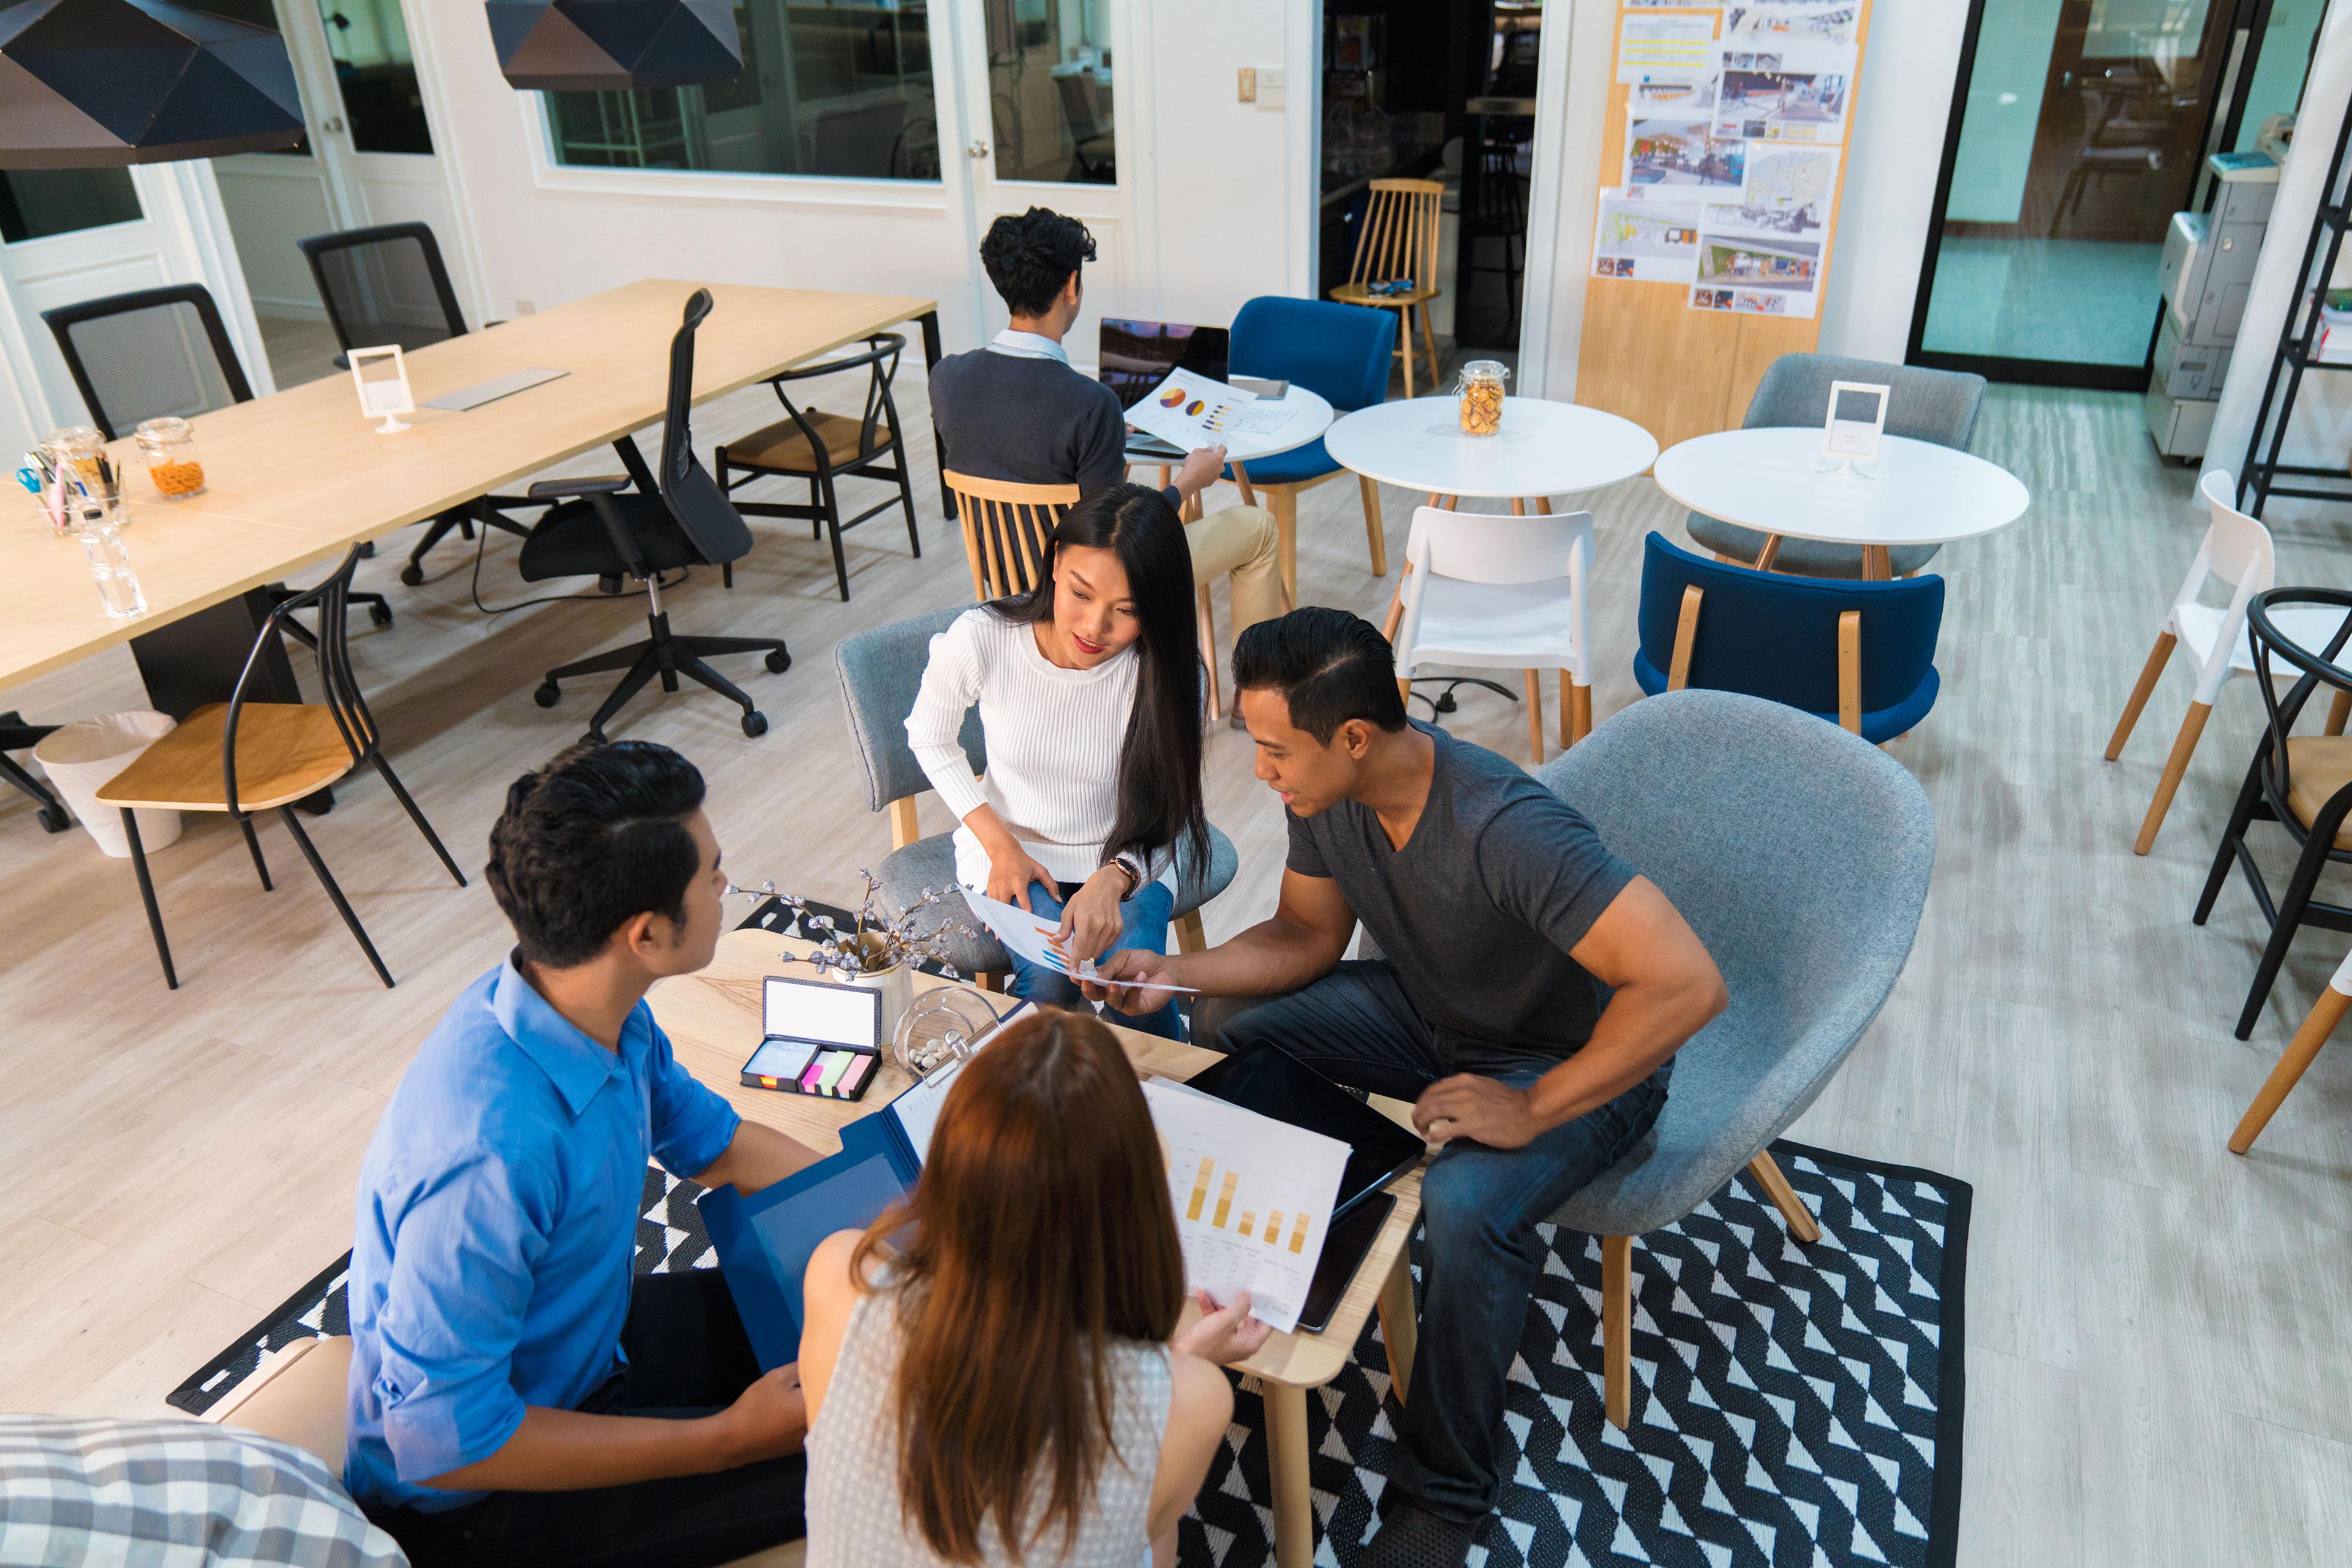 EY - Informal business meeting